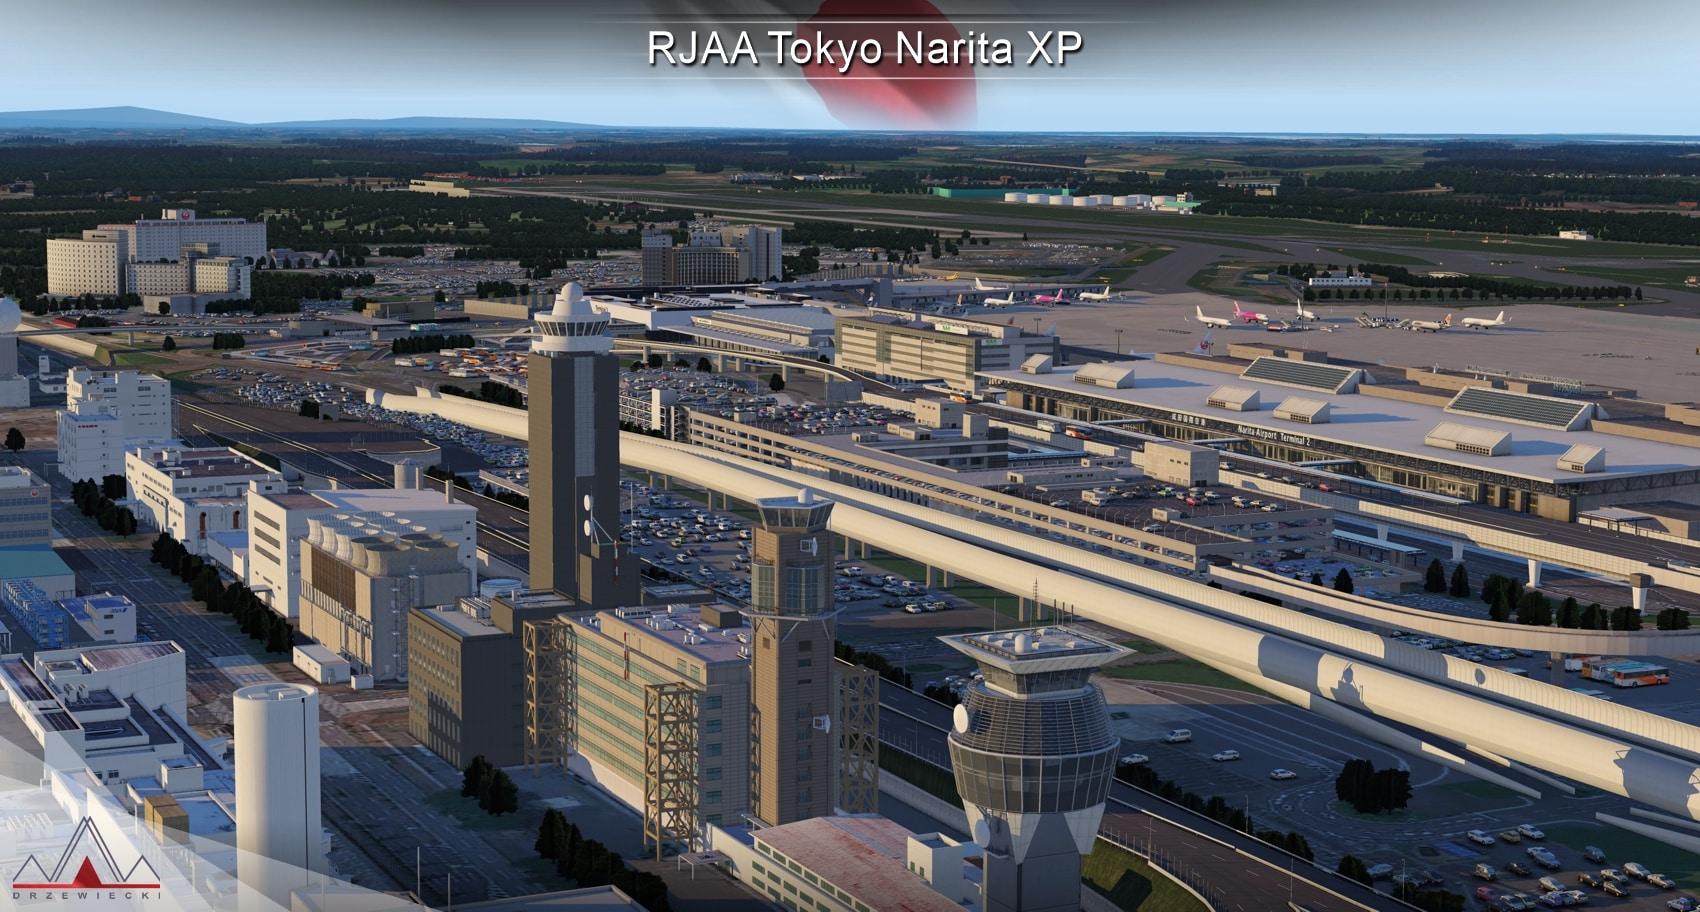 Drzewiecki Design – RJAA Tokyo Narita XP11